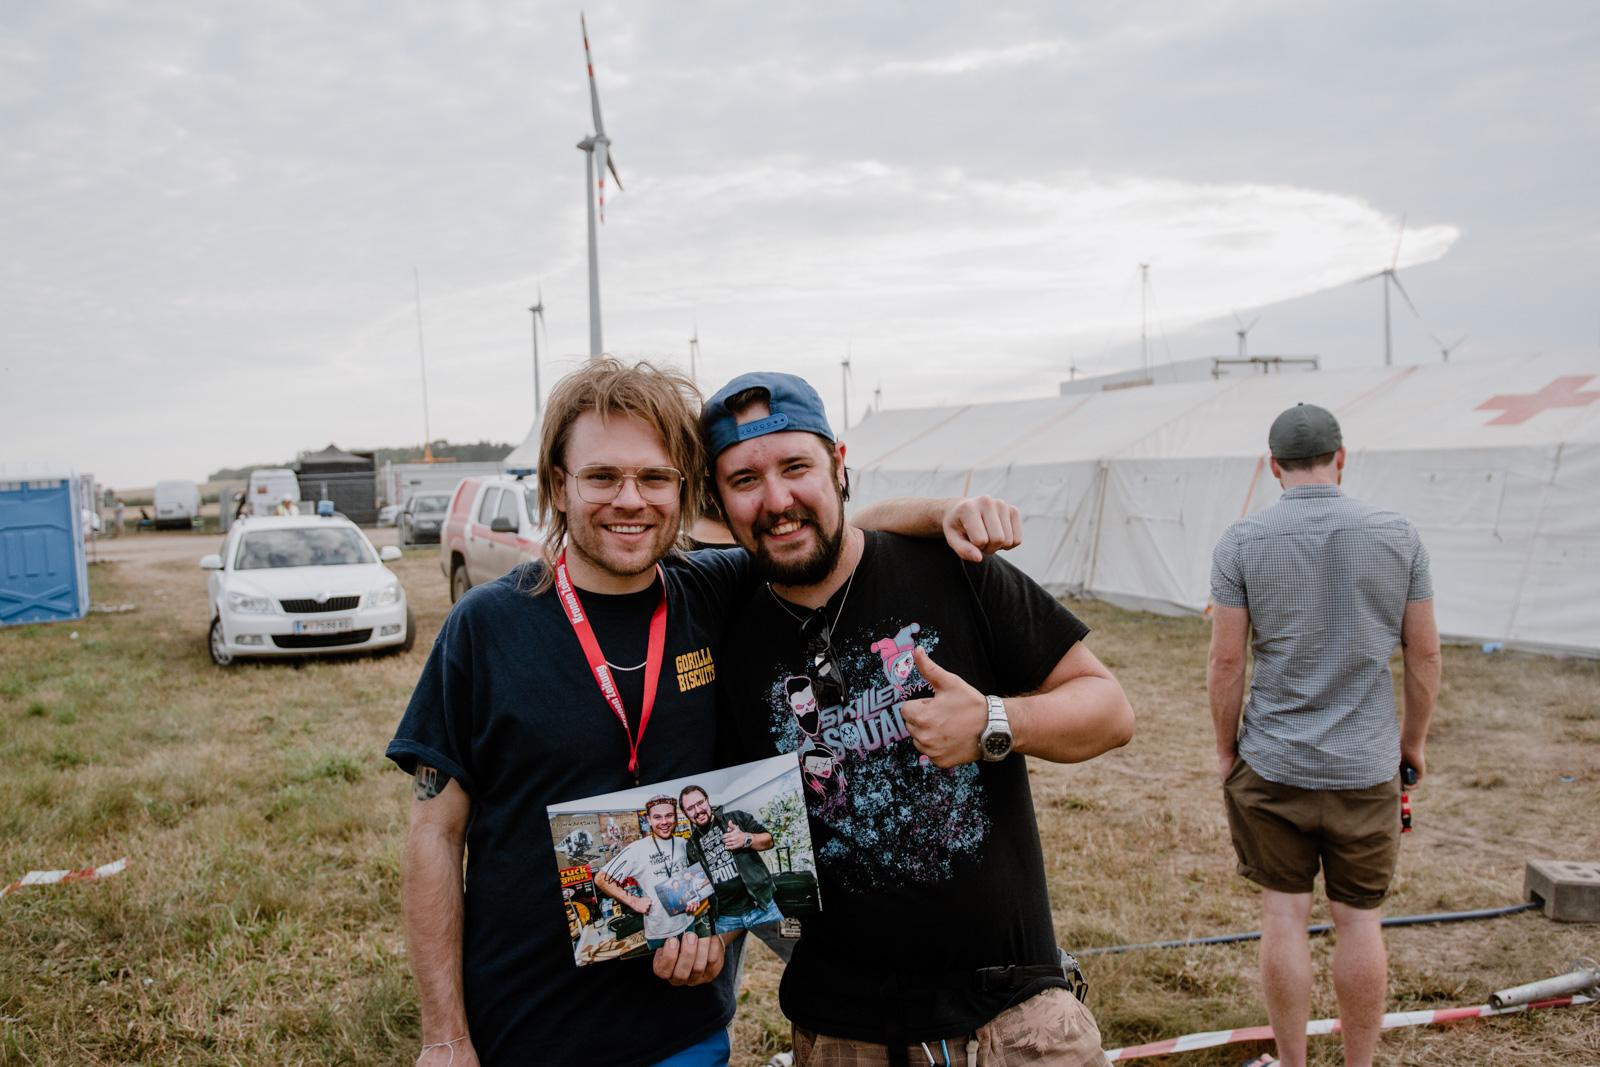 Best of Nova Rock Festival 2018 - Day 4